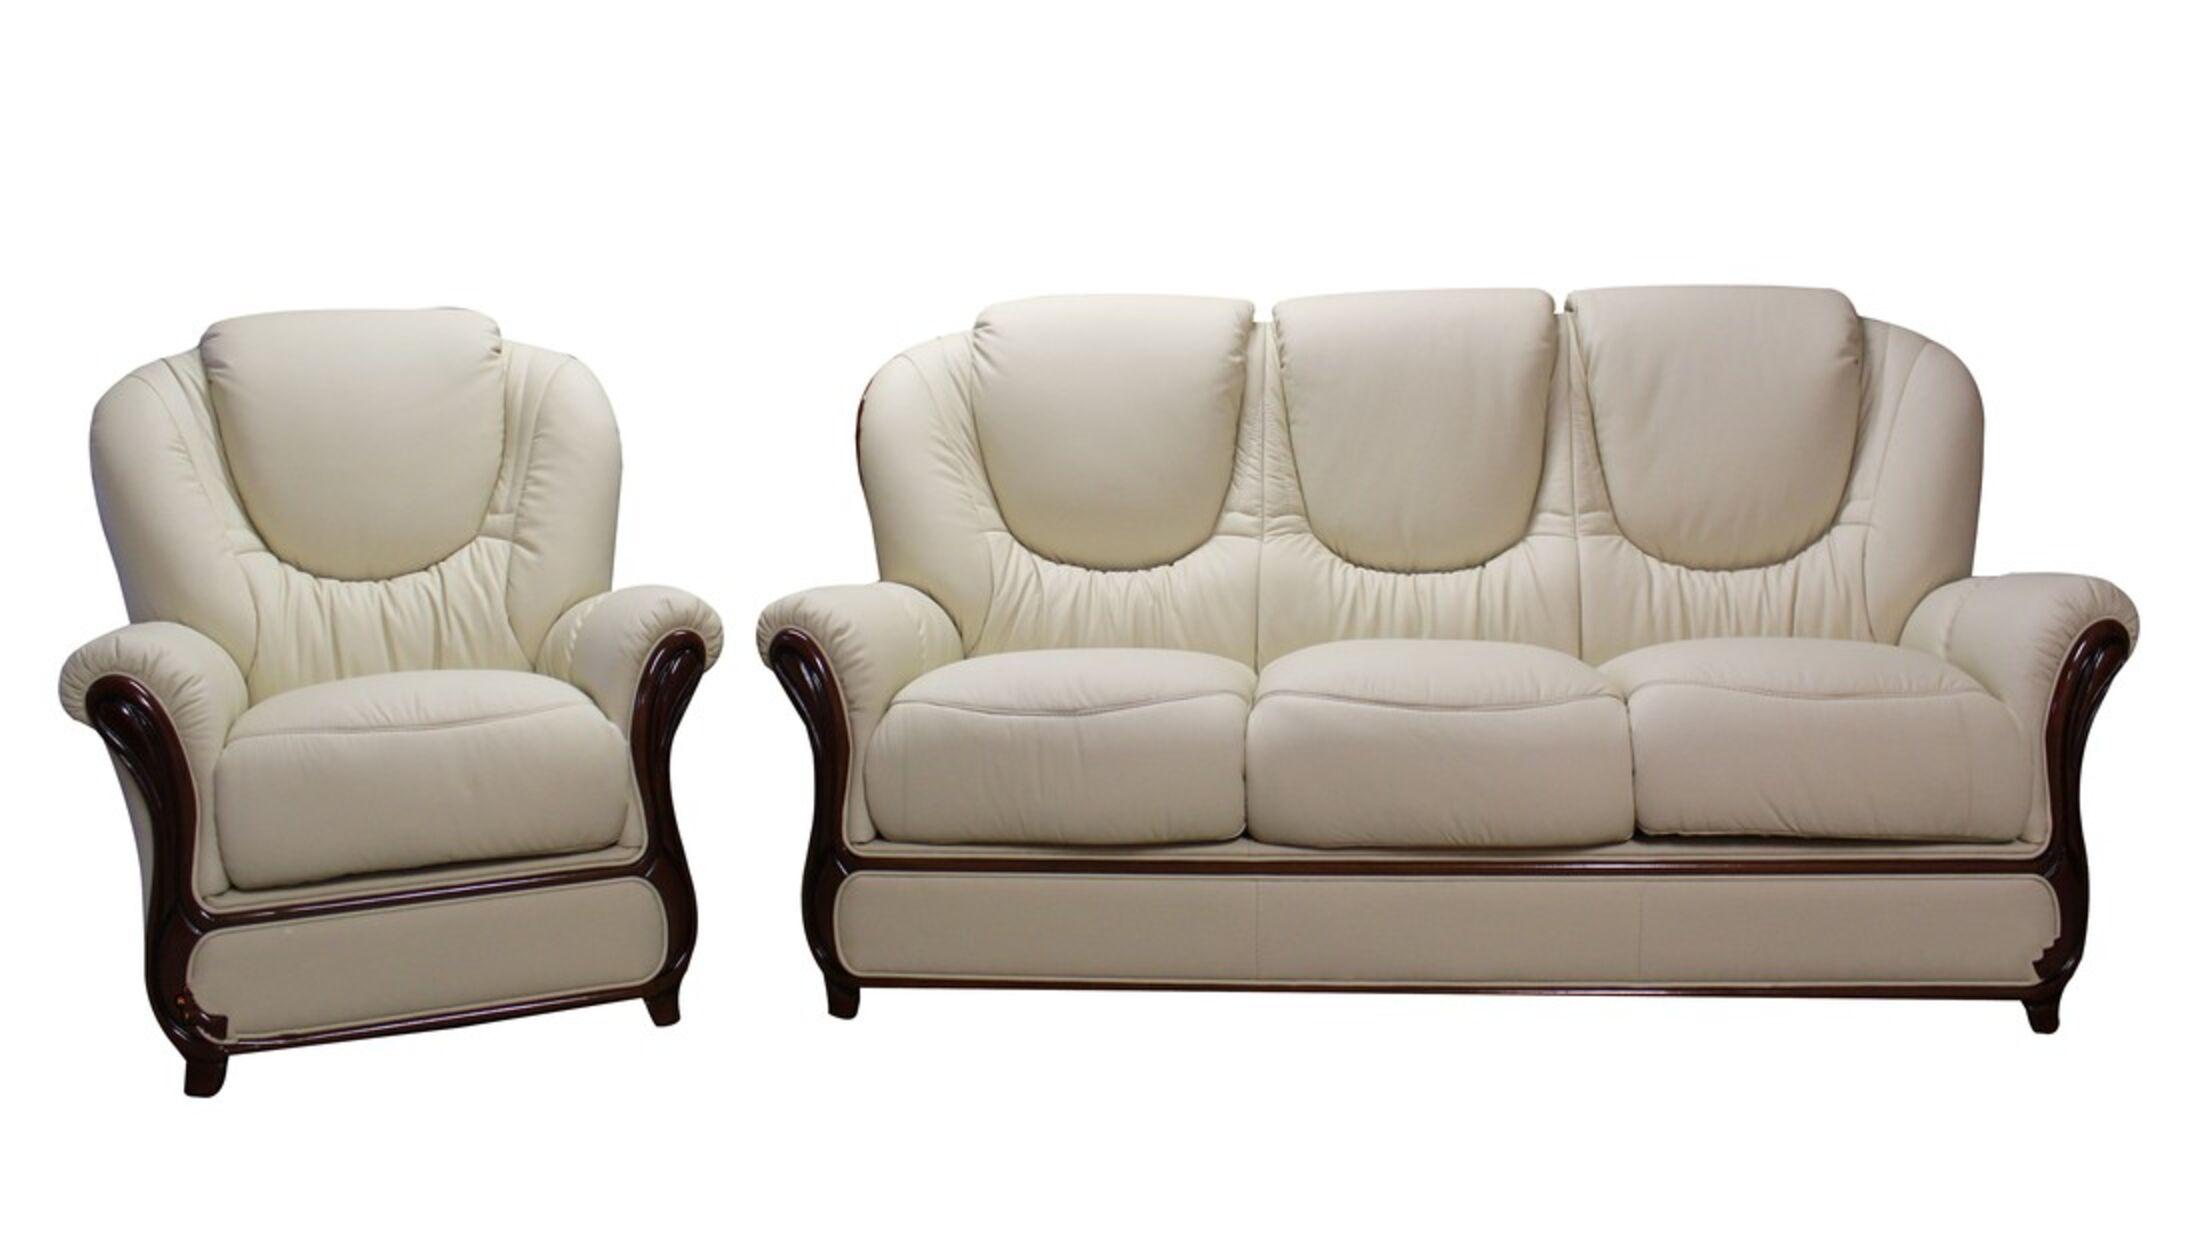 Juliet 3 Seater + Armchair Genuine Italian Cream Leather Sofa Suite Offer